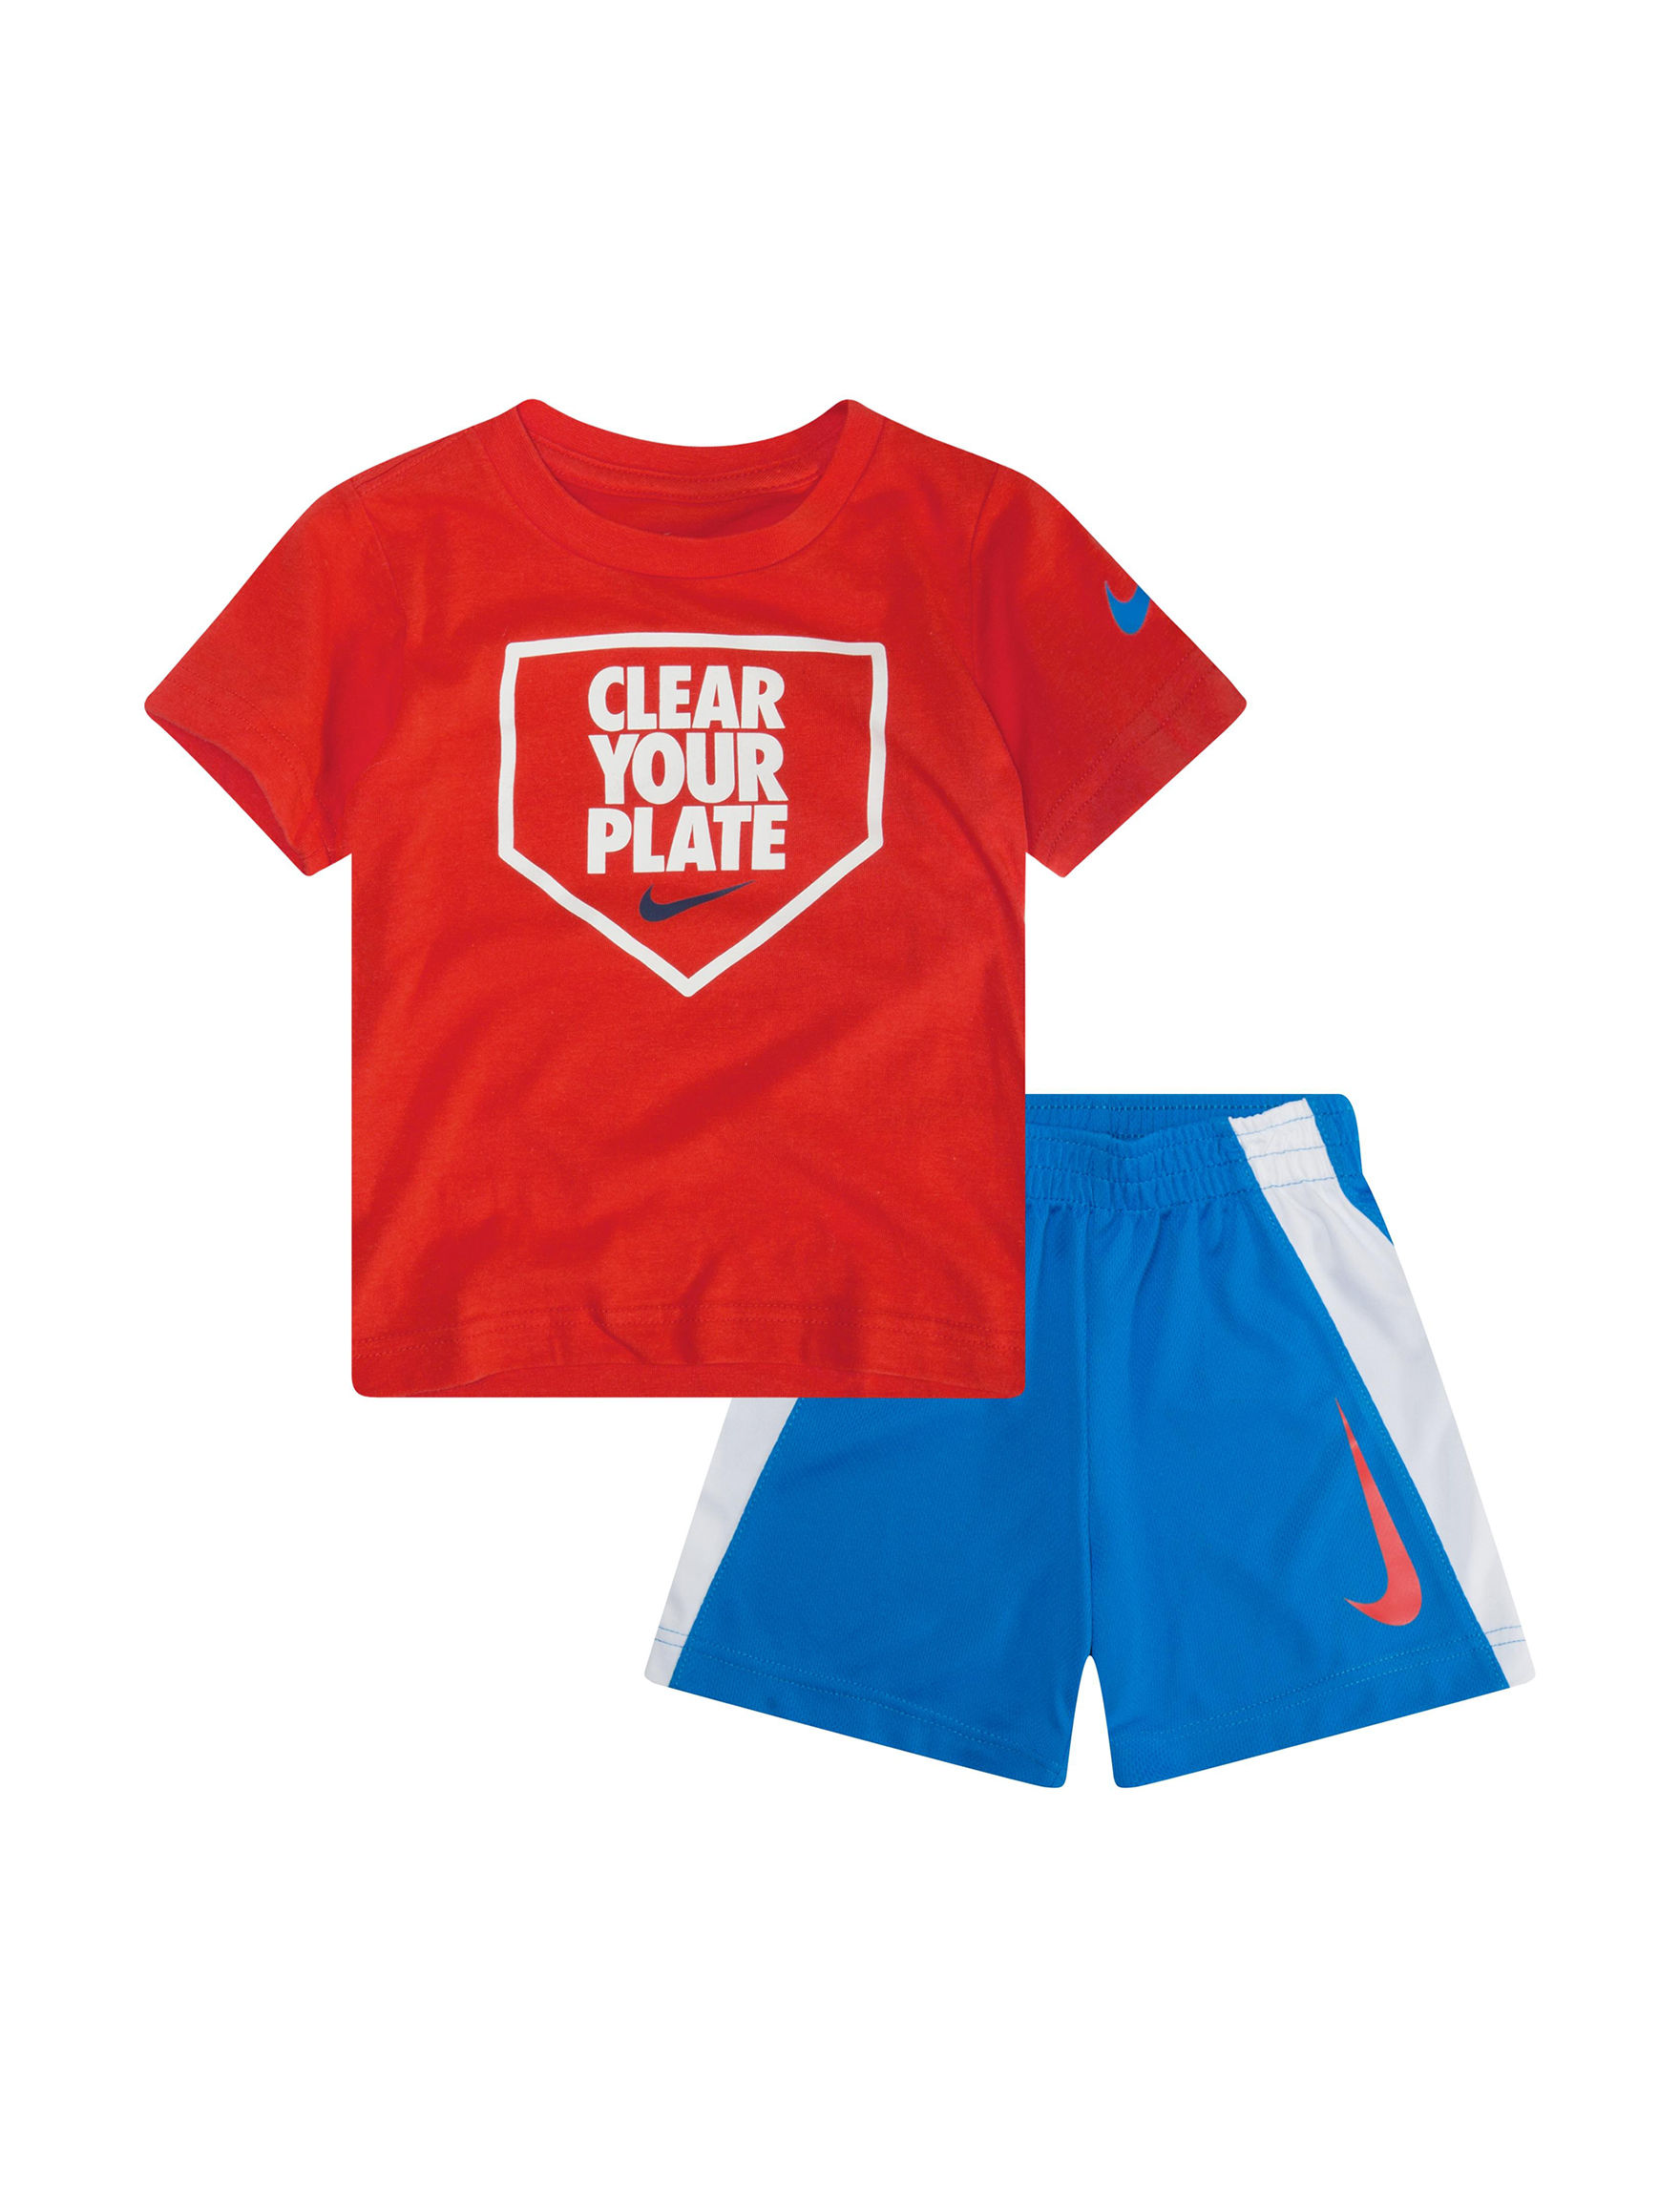 Nike Red / Blue